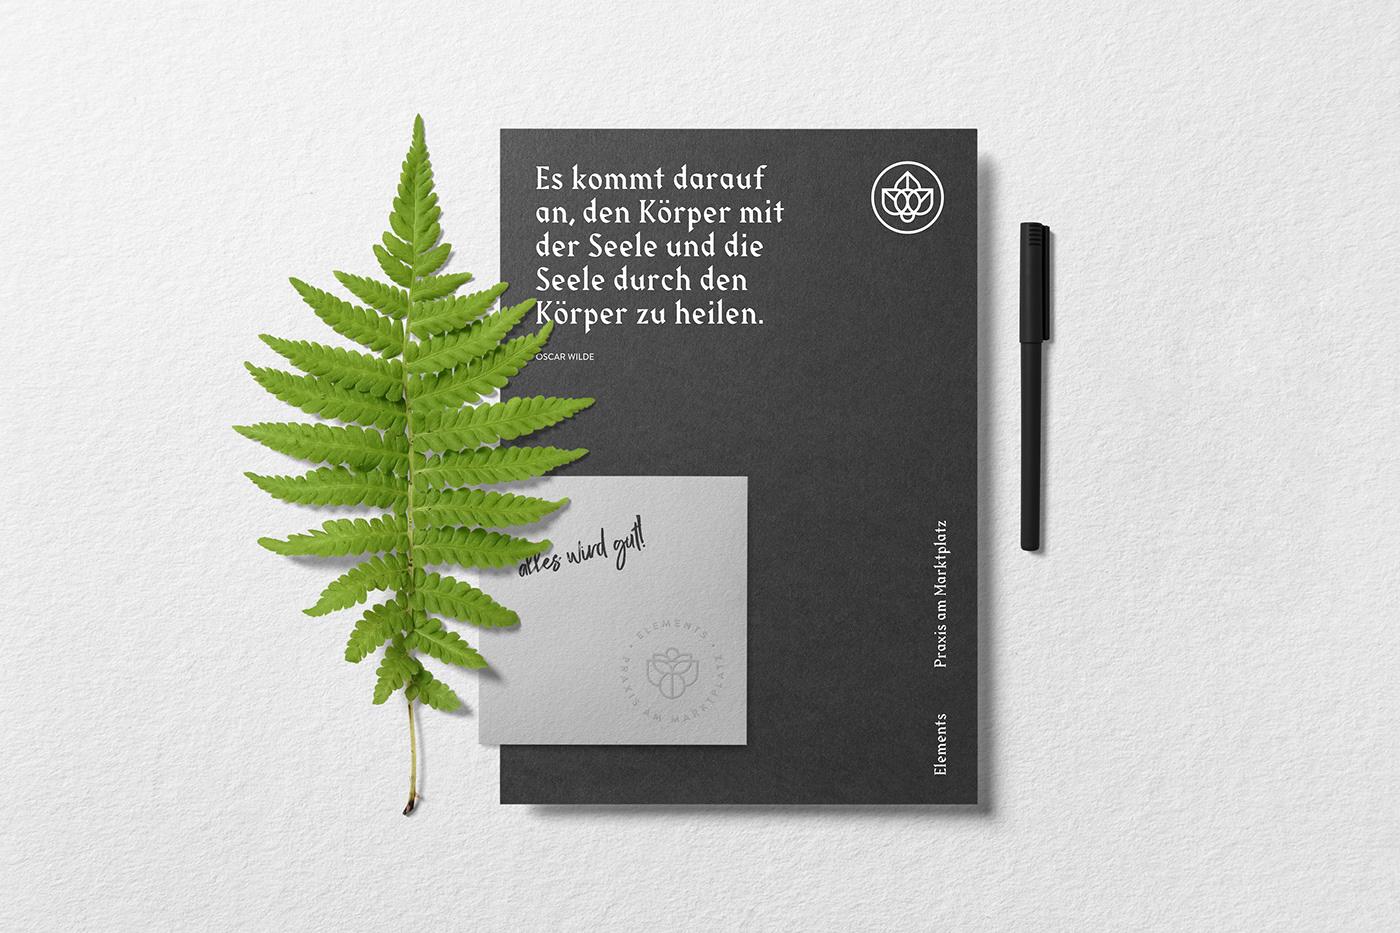 brand identity business card Corporate Design graphic design  logo Logo Design visual identity